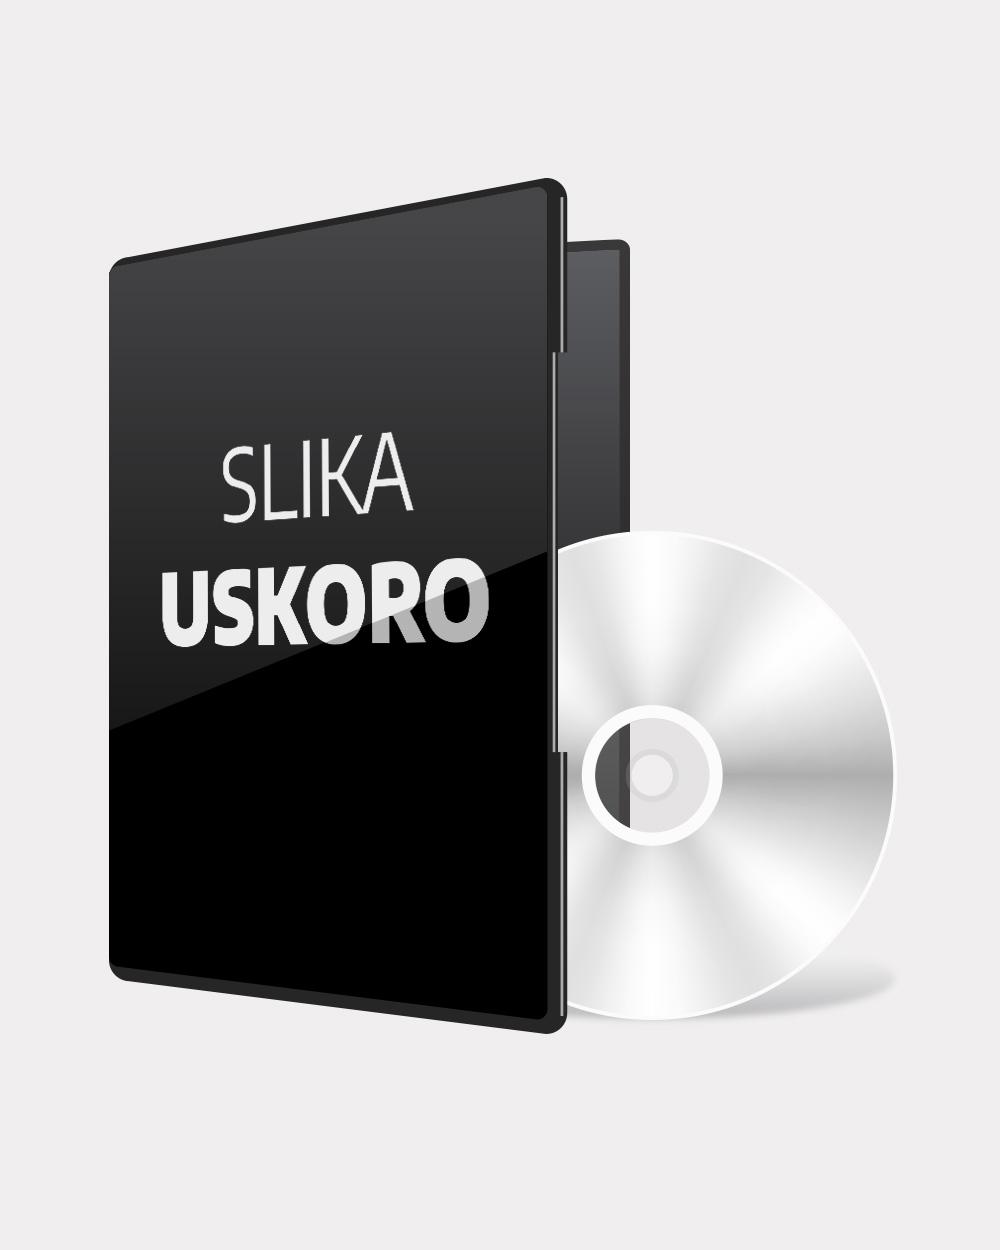 PS4 Star Wars - Jedi Fallen Order - Deluxe Edition